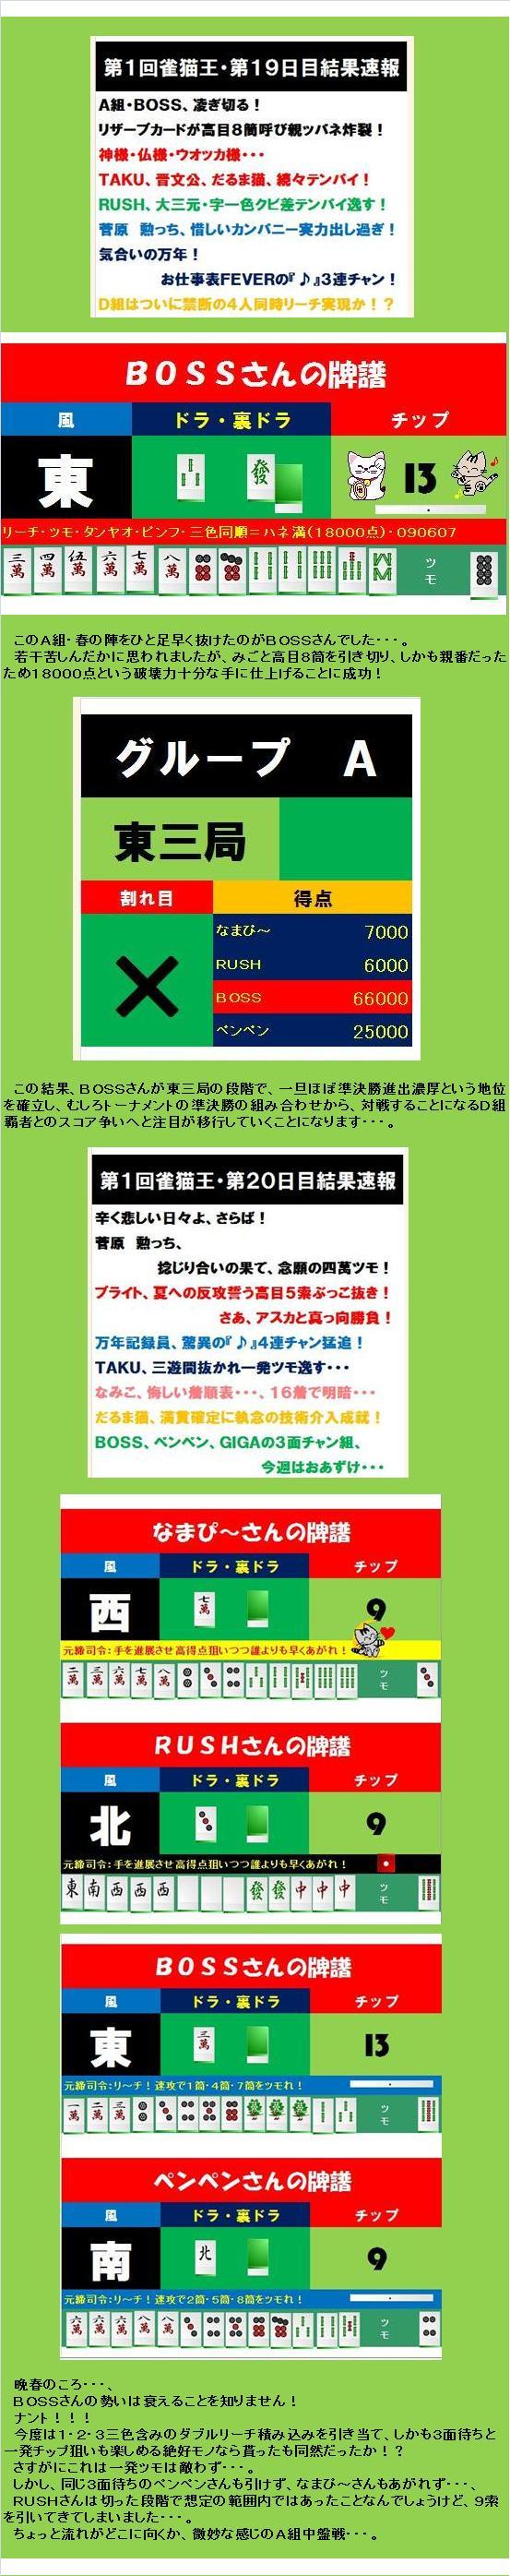 20100226・A組回顧10.jpg